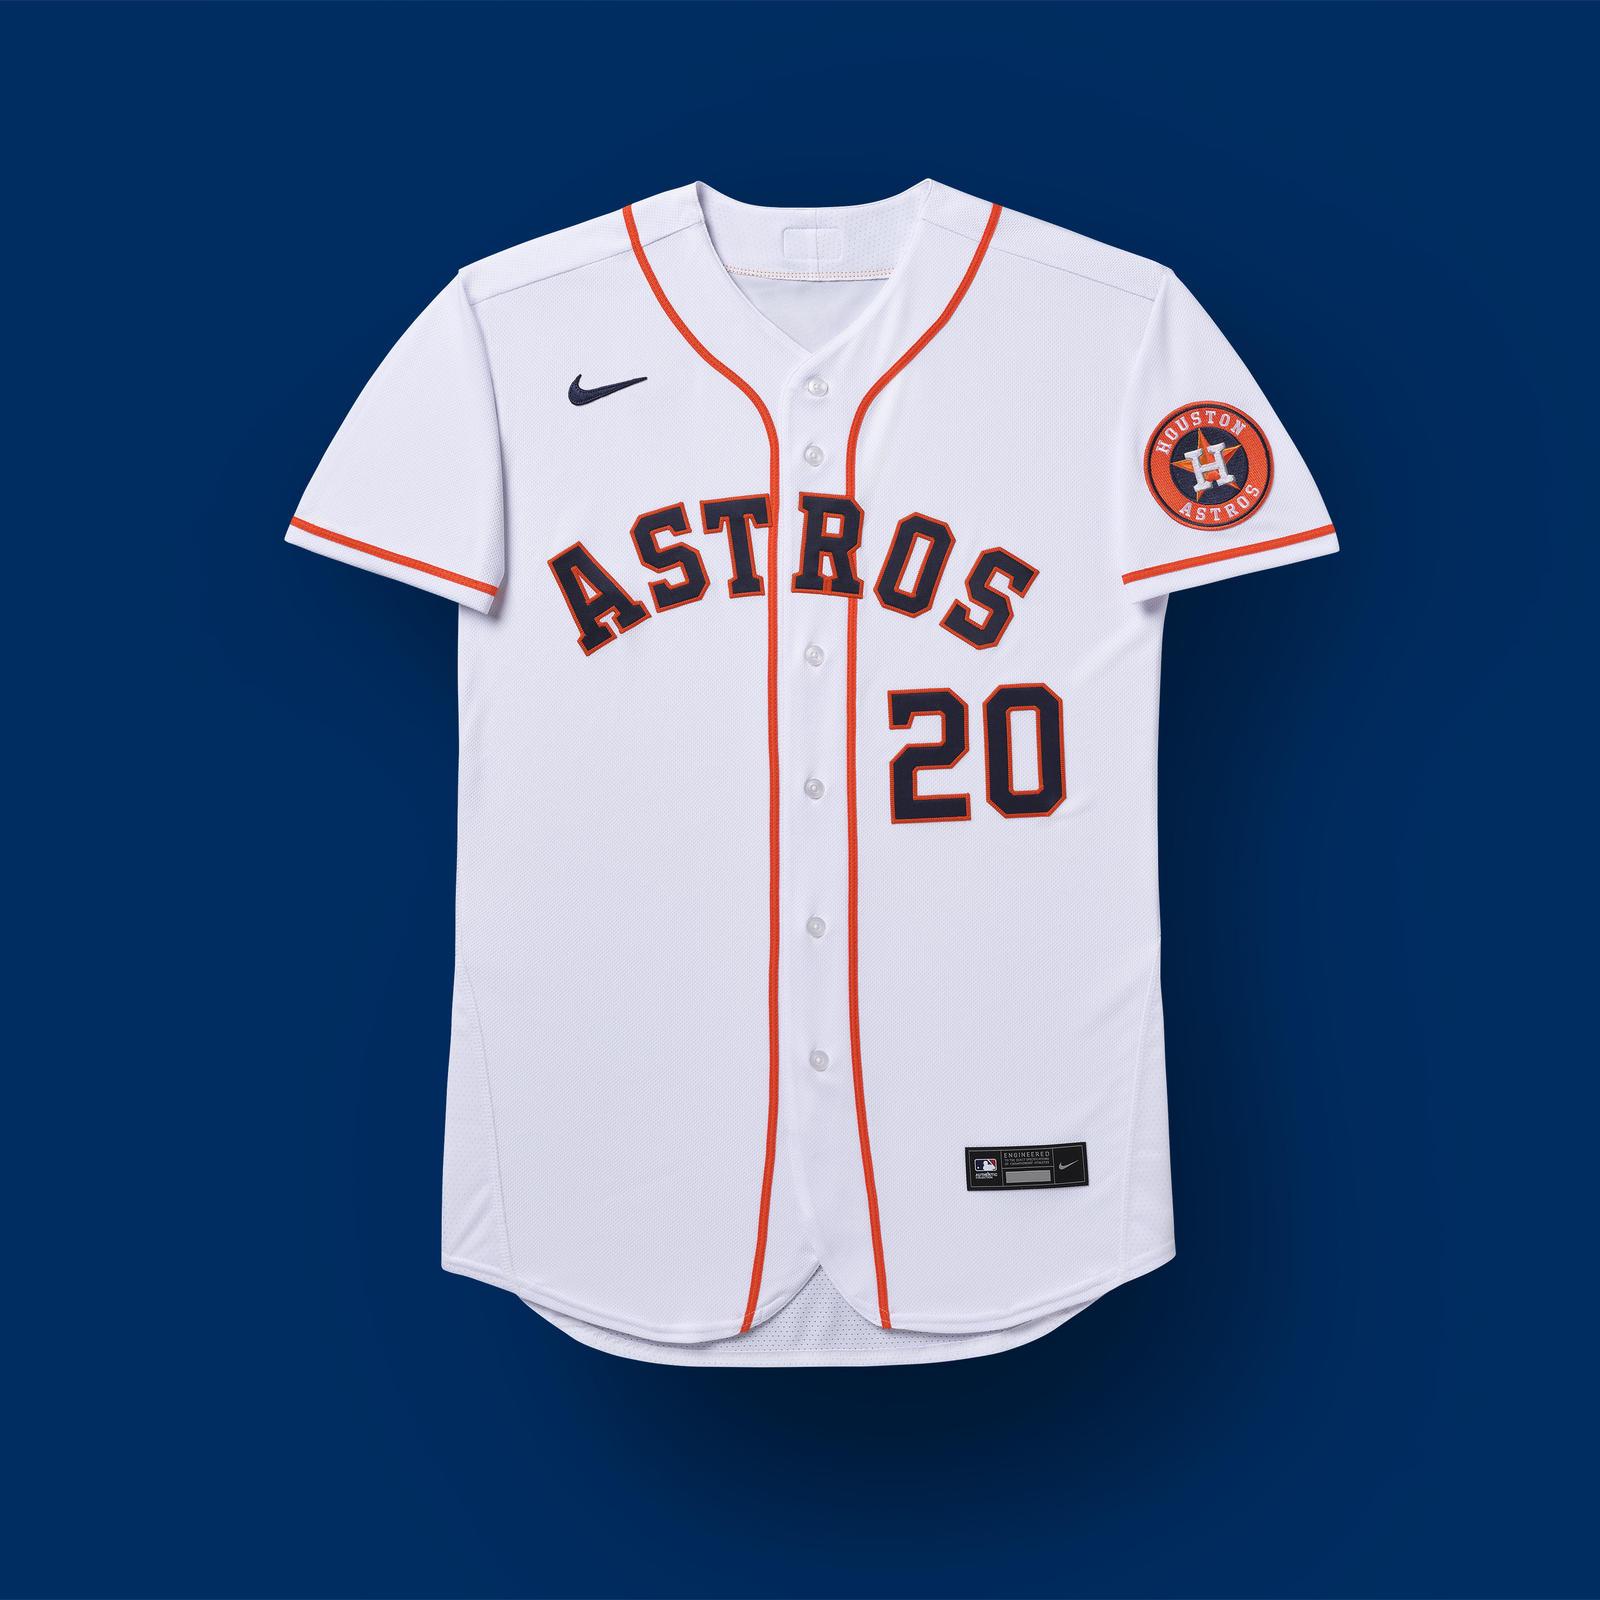 Nike x Major League Baseball Uniforms 2020 Official Images - Nike News